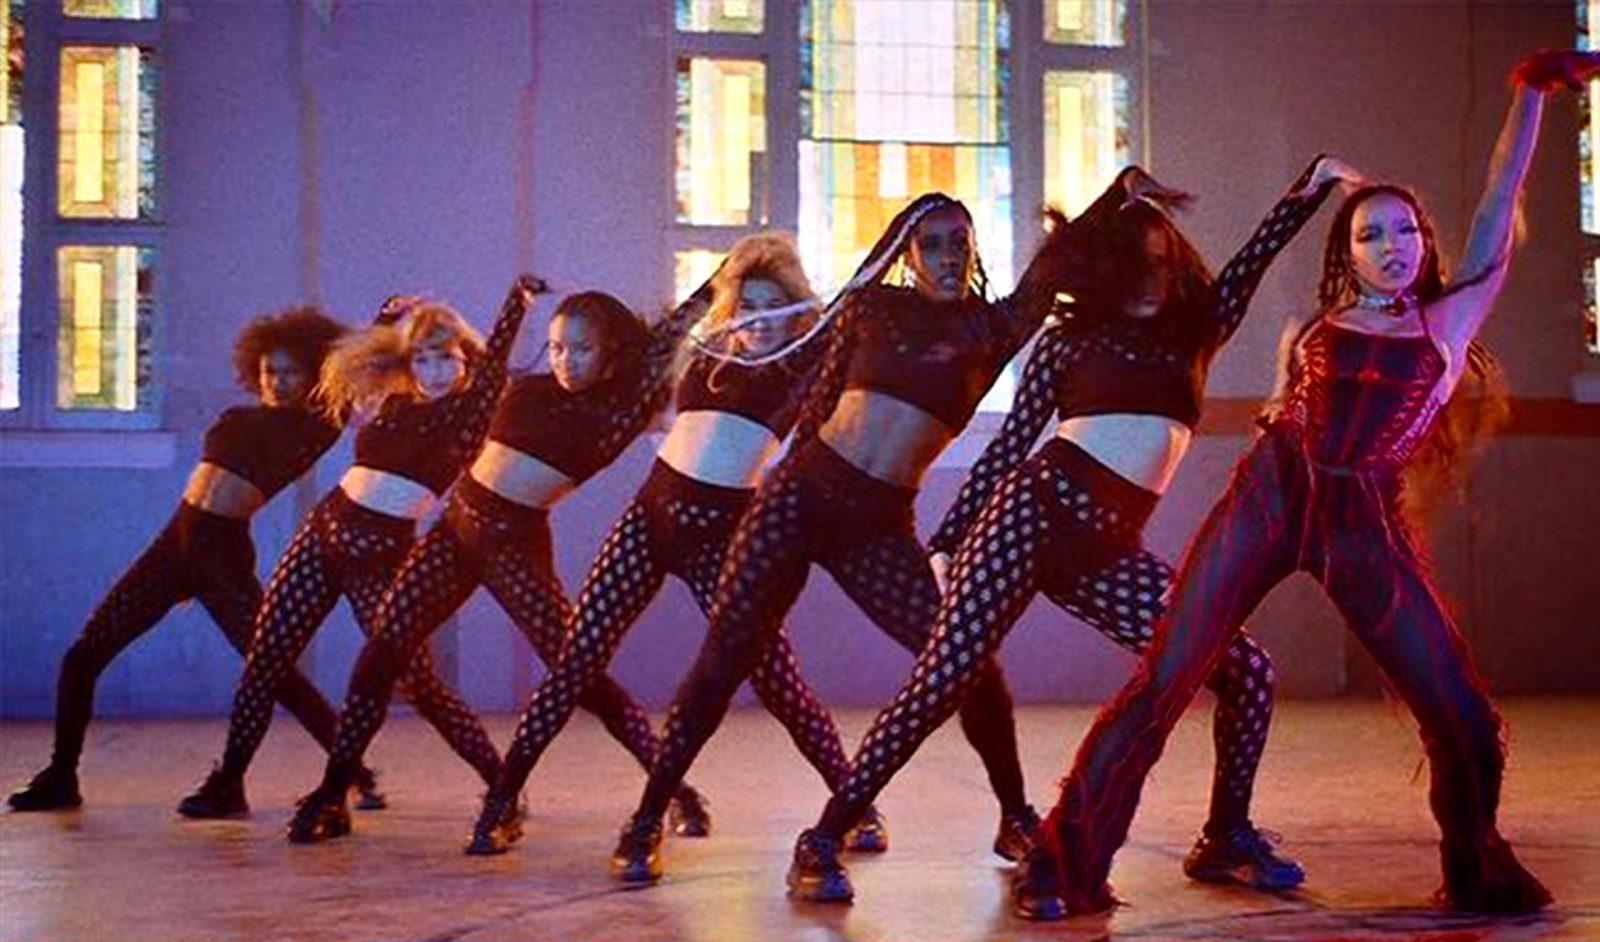 Tinashe Releases 'Bouncin' + Announces '333' Tour   SWGRUS